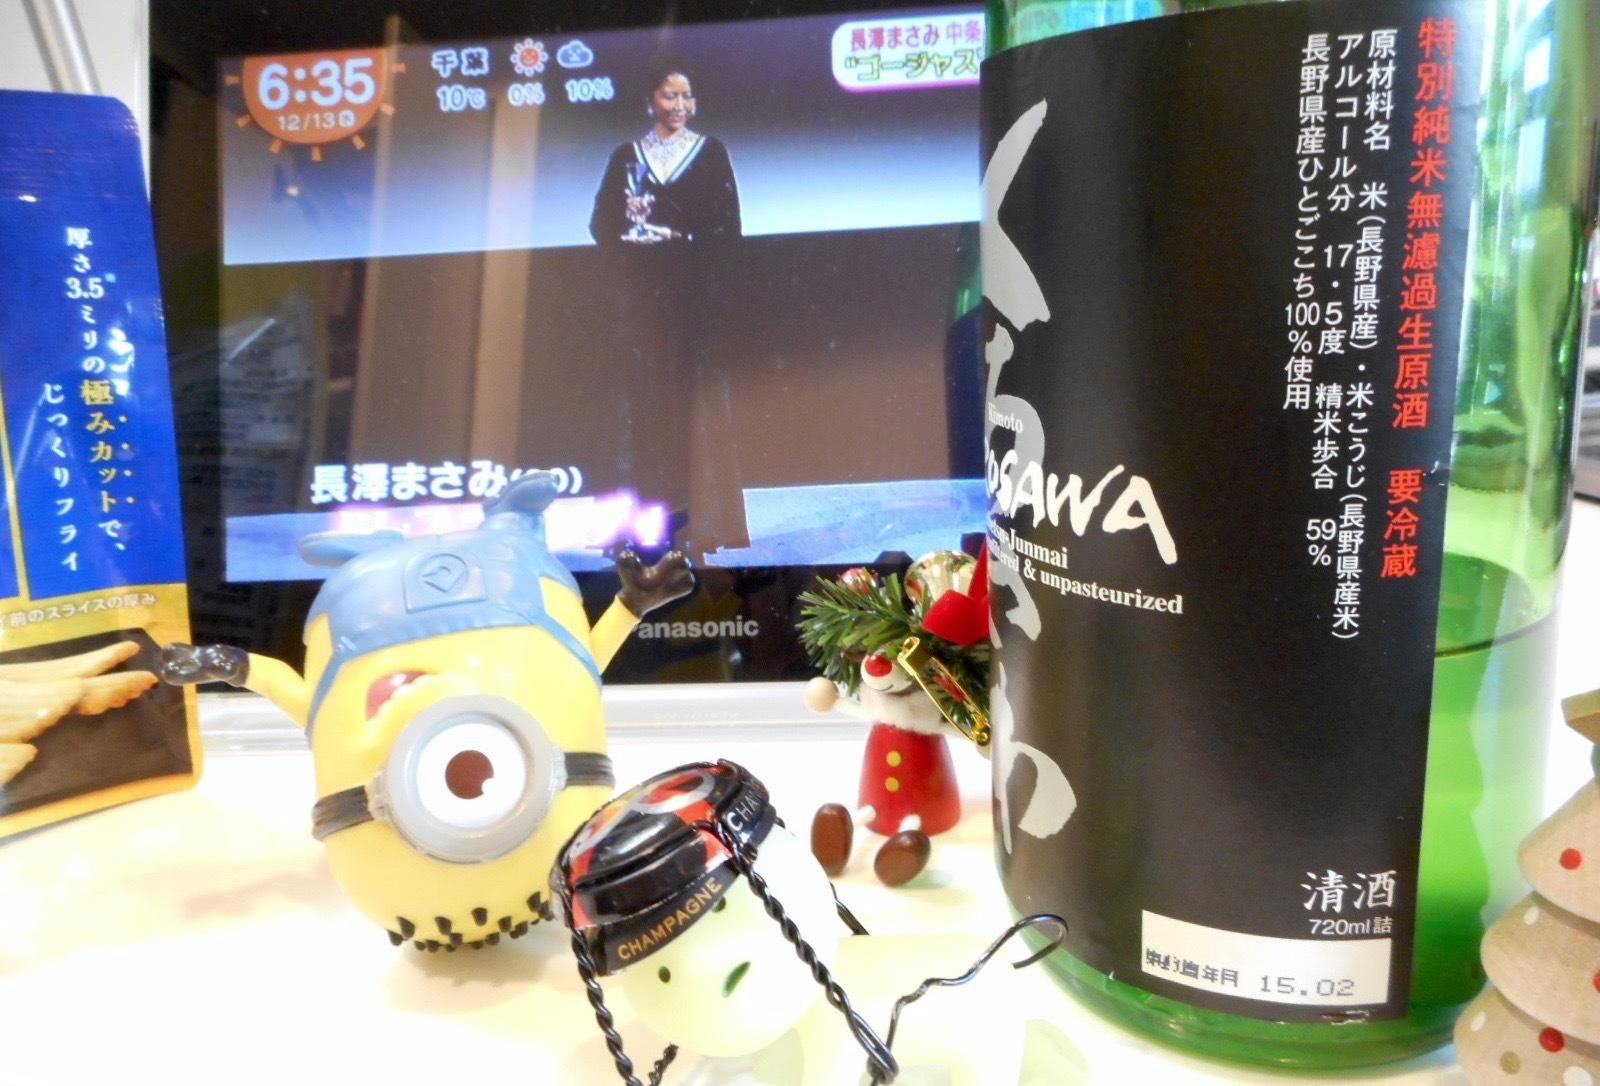 kurosawa_tokujun26by2.jpg